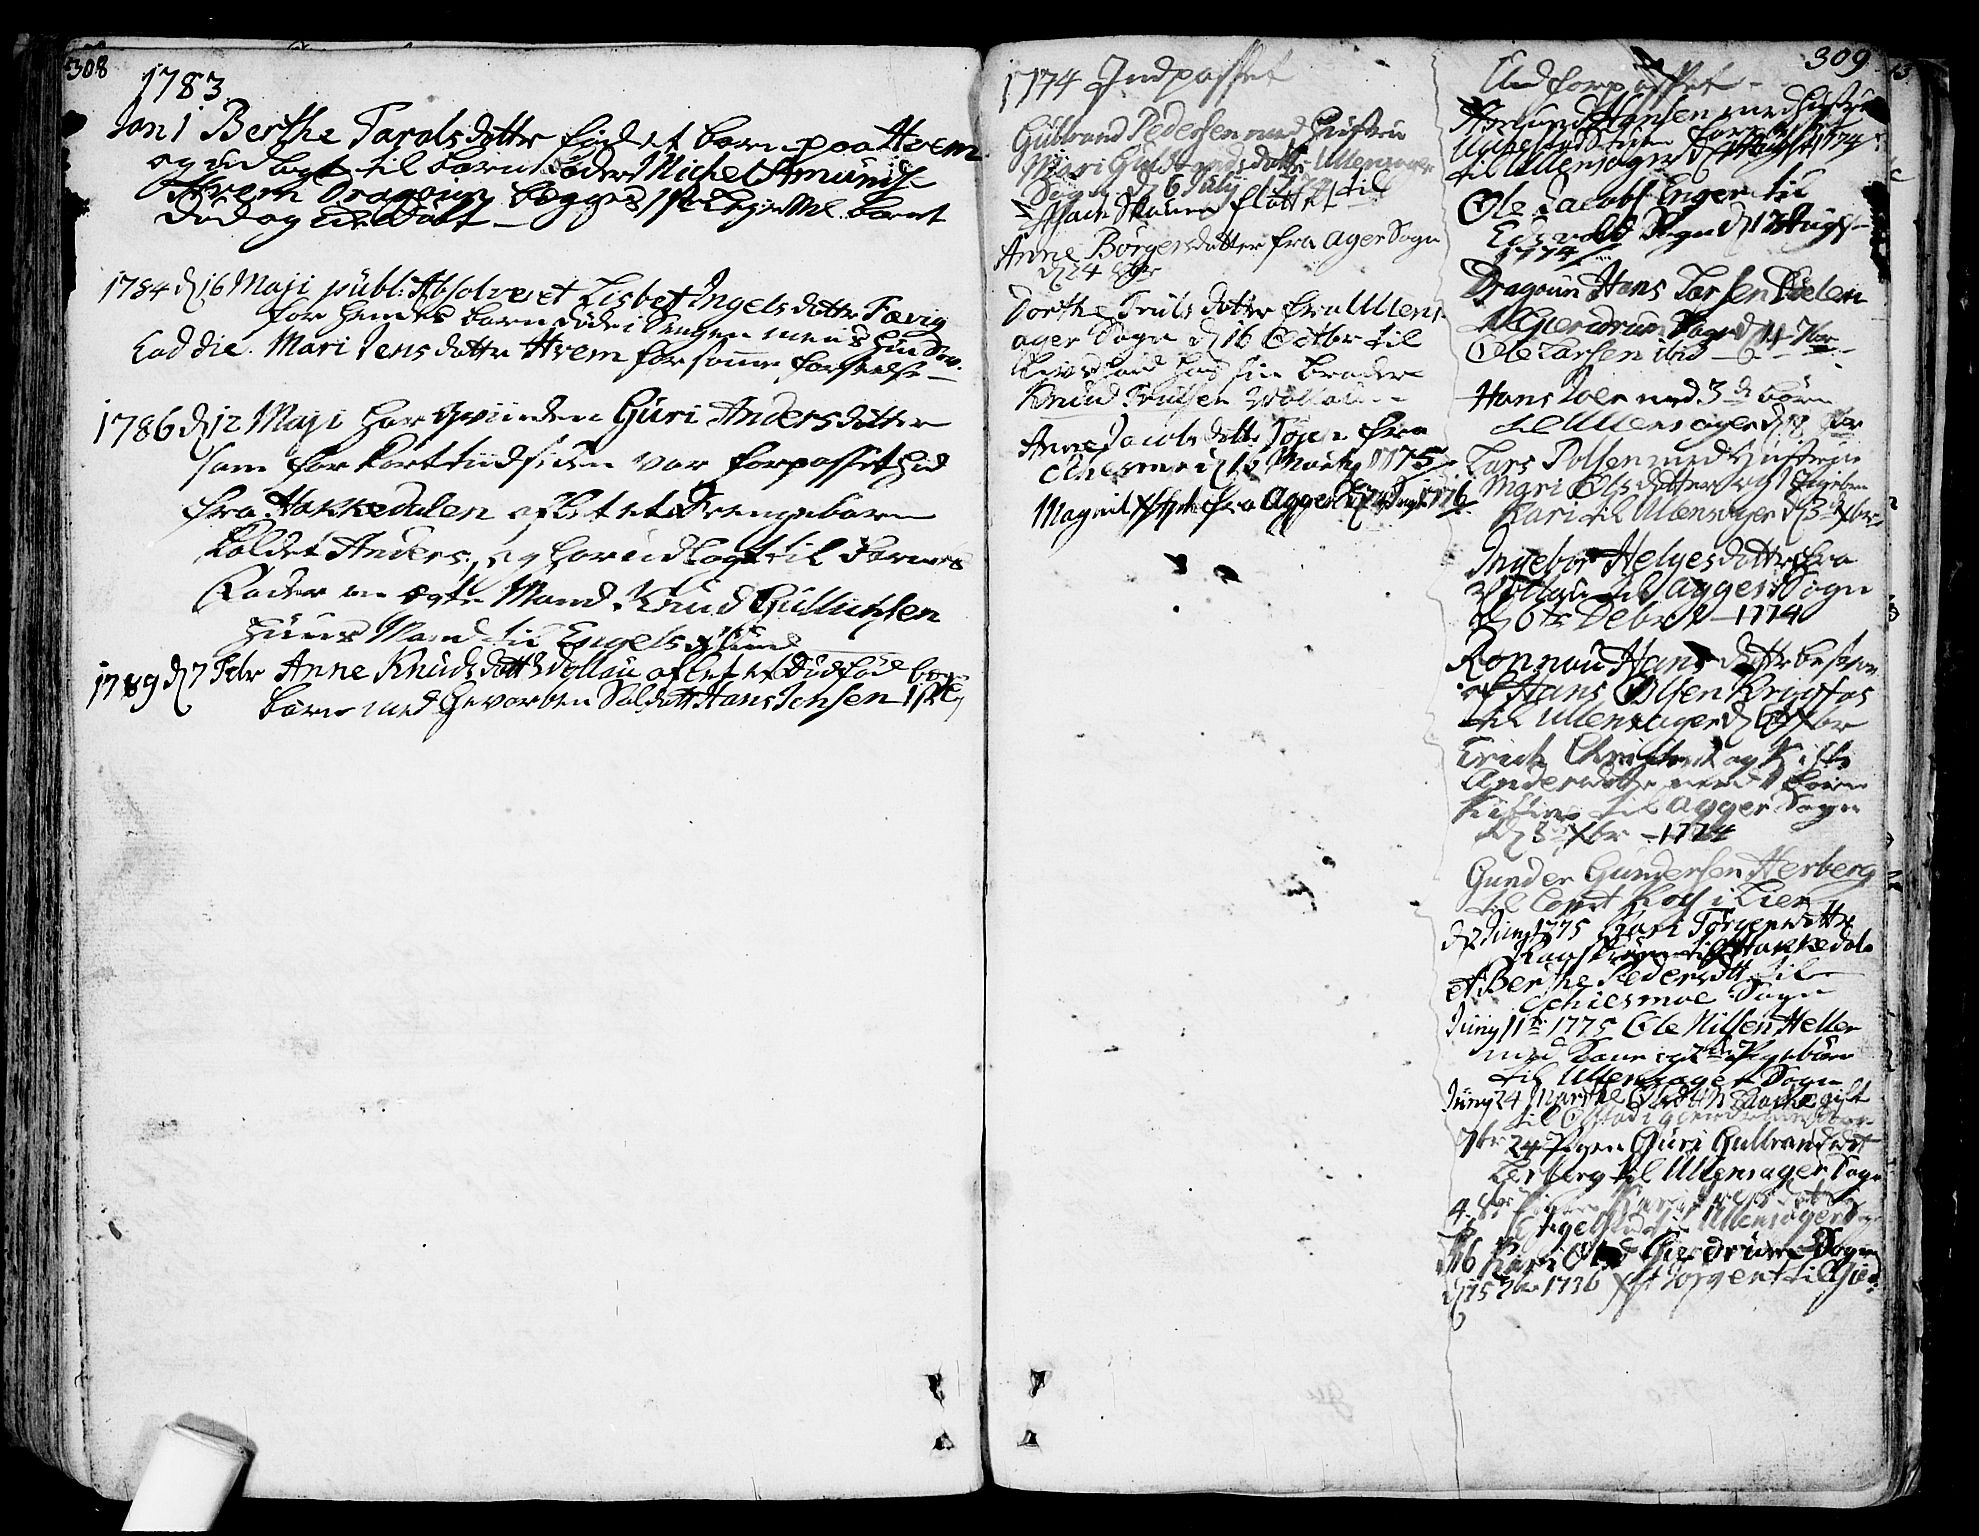 SAO, Nannestad prestekontor Kirkebøker, F/Fa/L0007: Ministerialbok nr. I 7, 1754-1791, s. 308-309